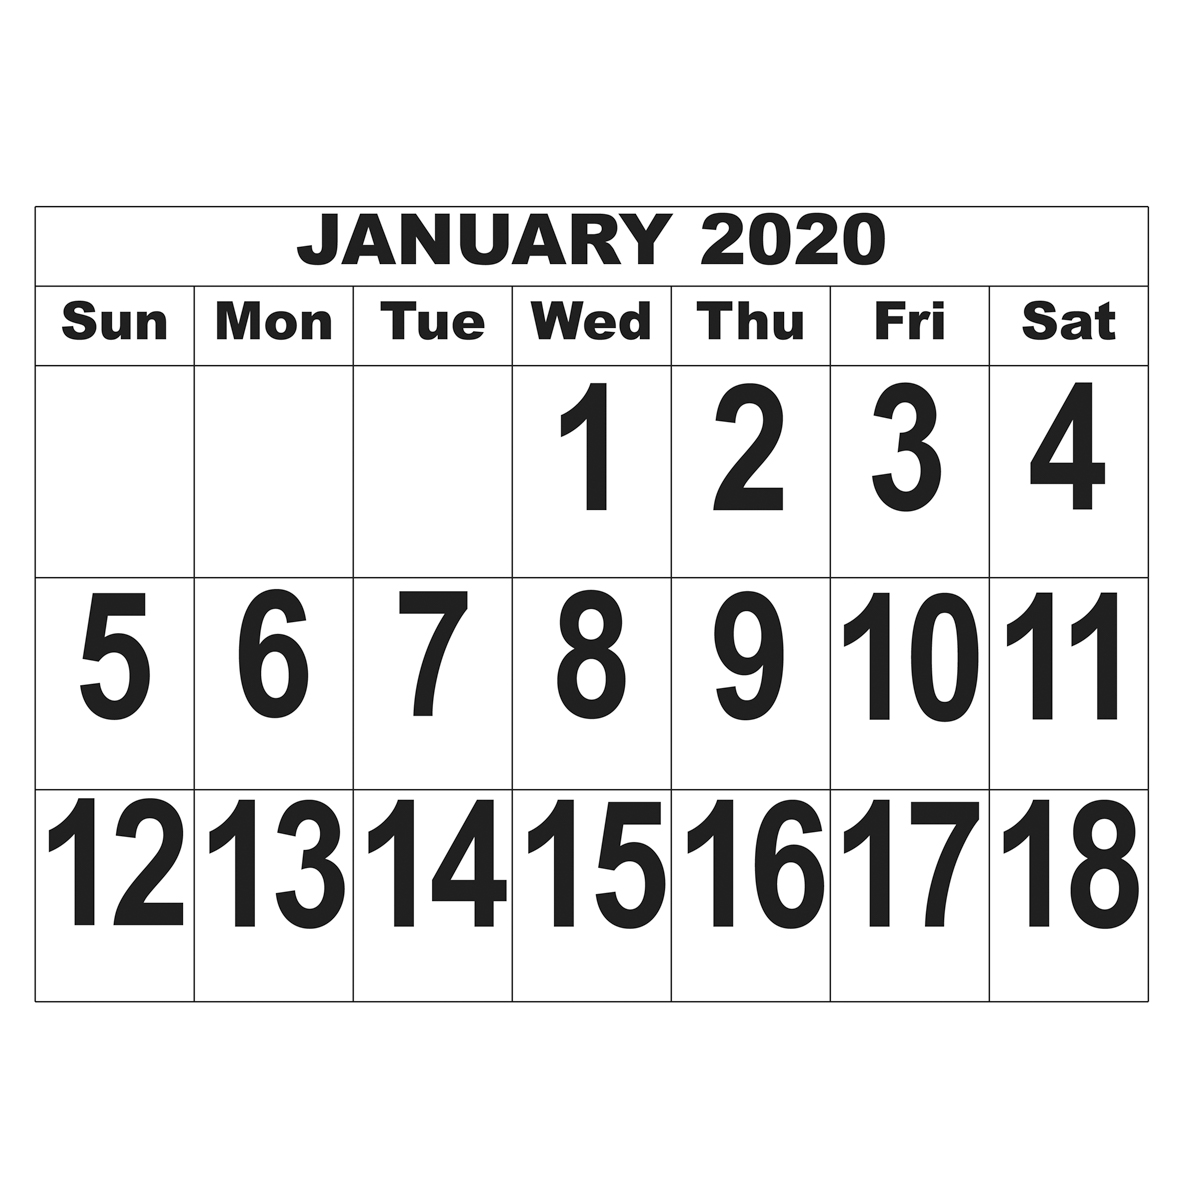 Giant Print Date Calendar - 2020